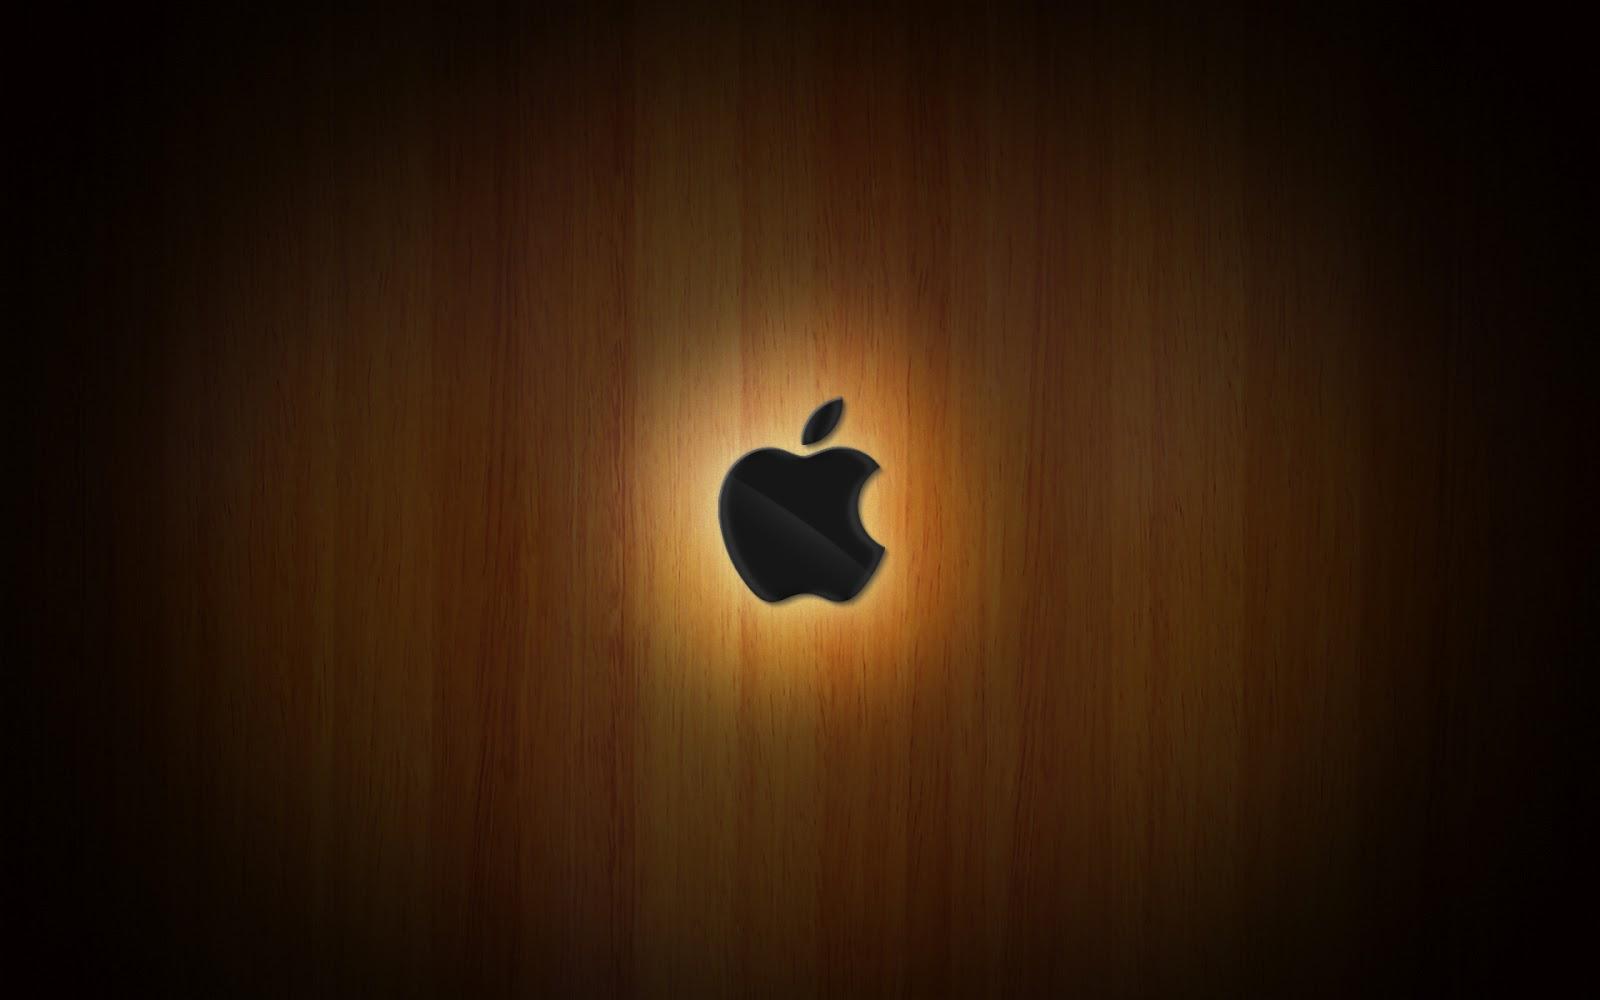 http://2.bp.blogspot.com/-8asHJfc6or4/UESVVZ3zGLI/AAAAAAAAD8I/-PcA0JTHtns/s1600/wood_apple_wallpaper_by_diegocadorin.jpg